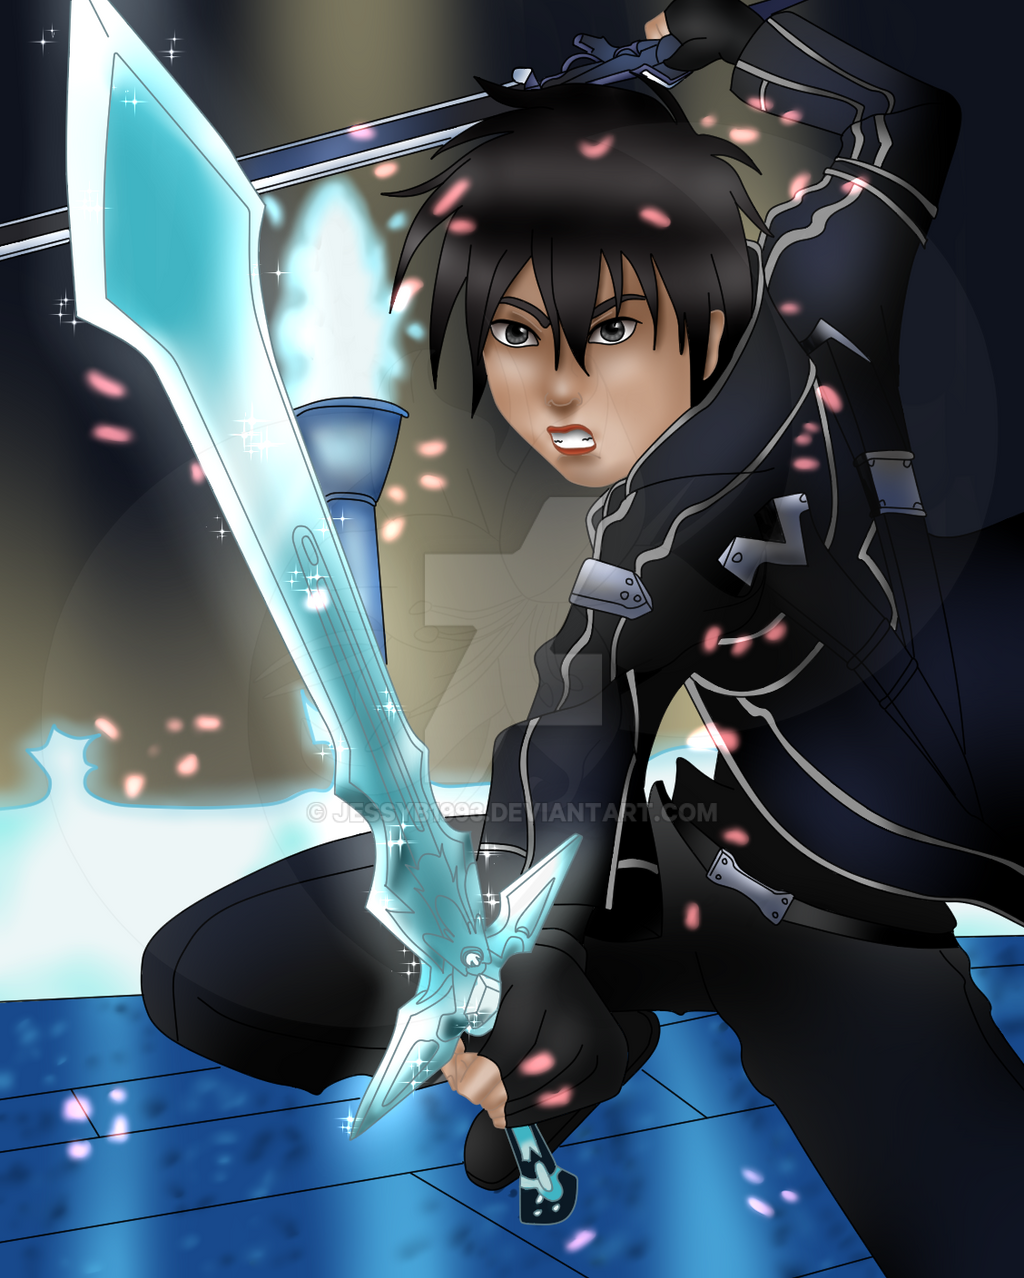 Kirito Sword art Online Fanart by JessyB1993 on DeviantArt